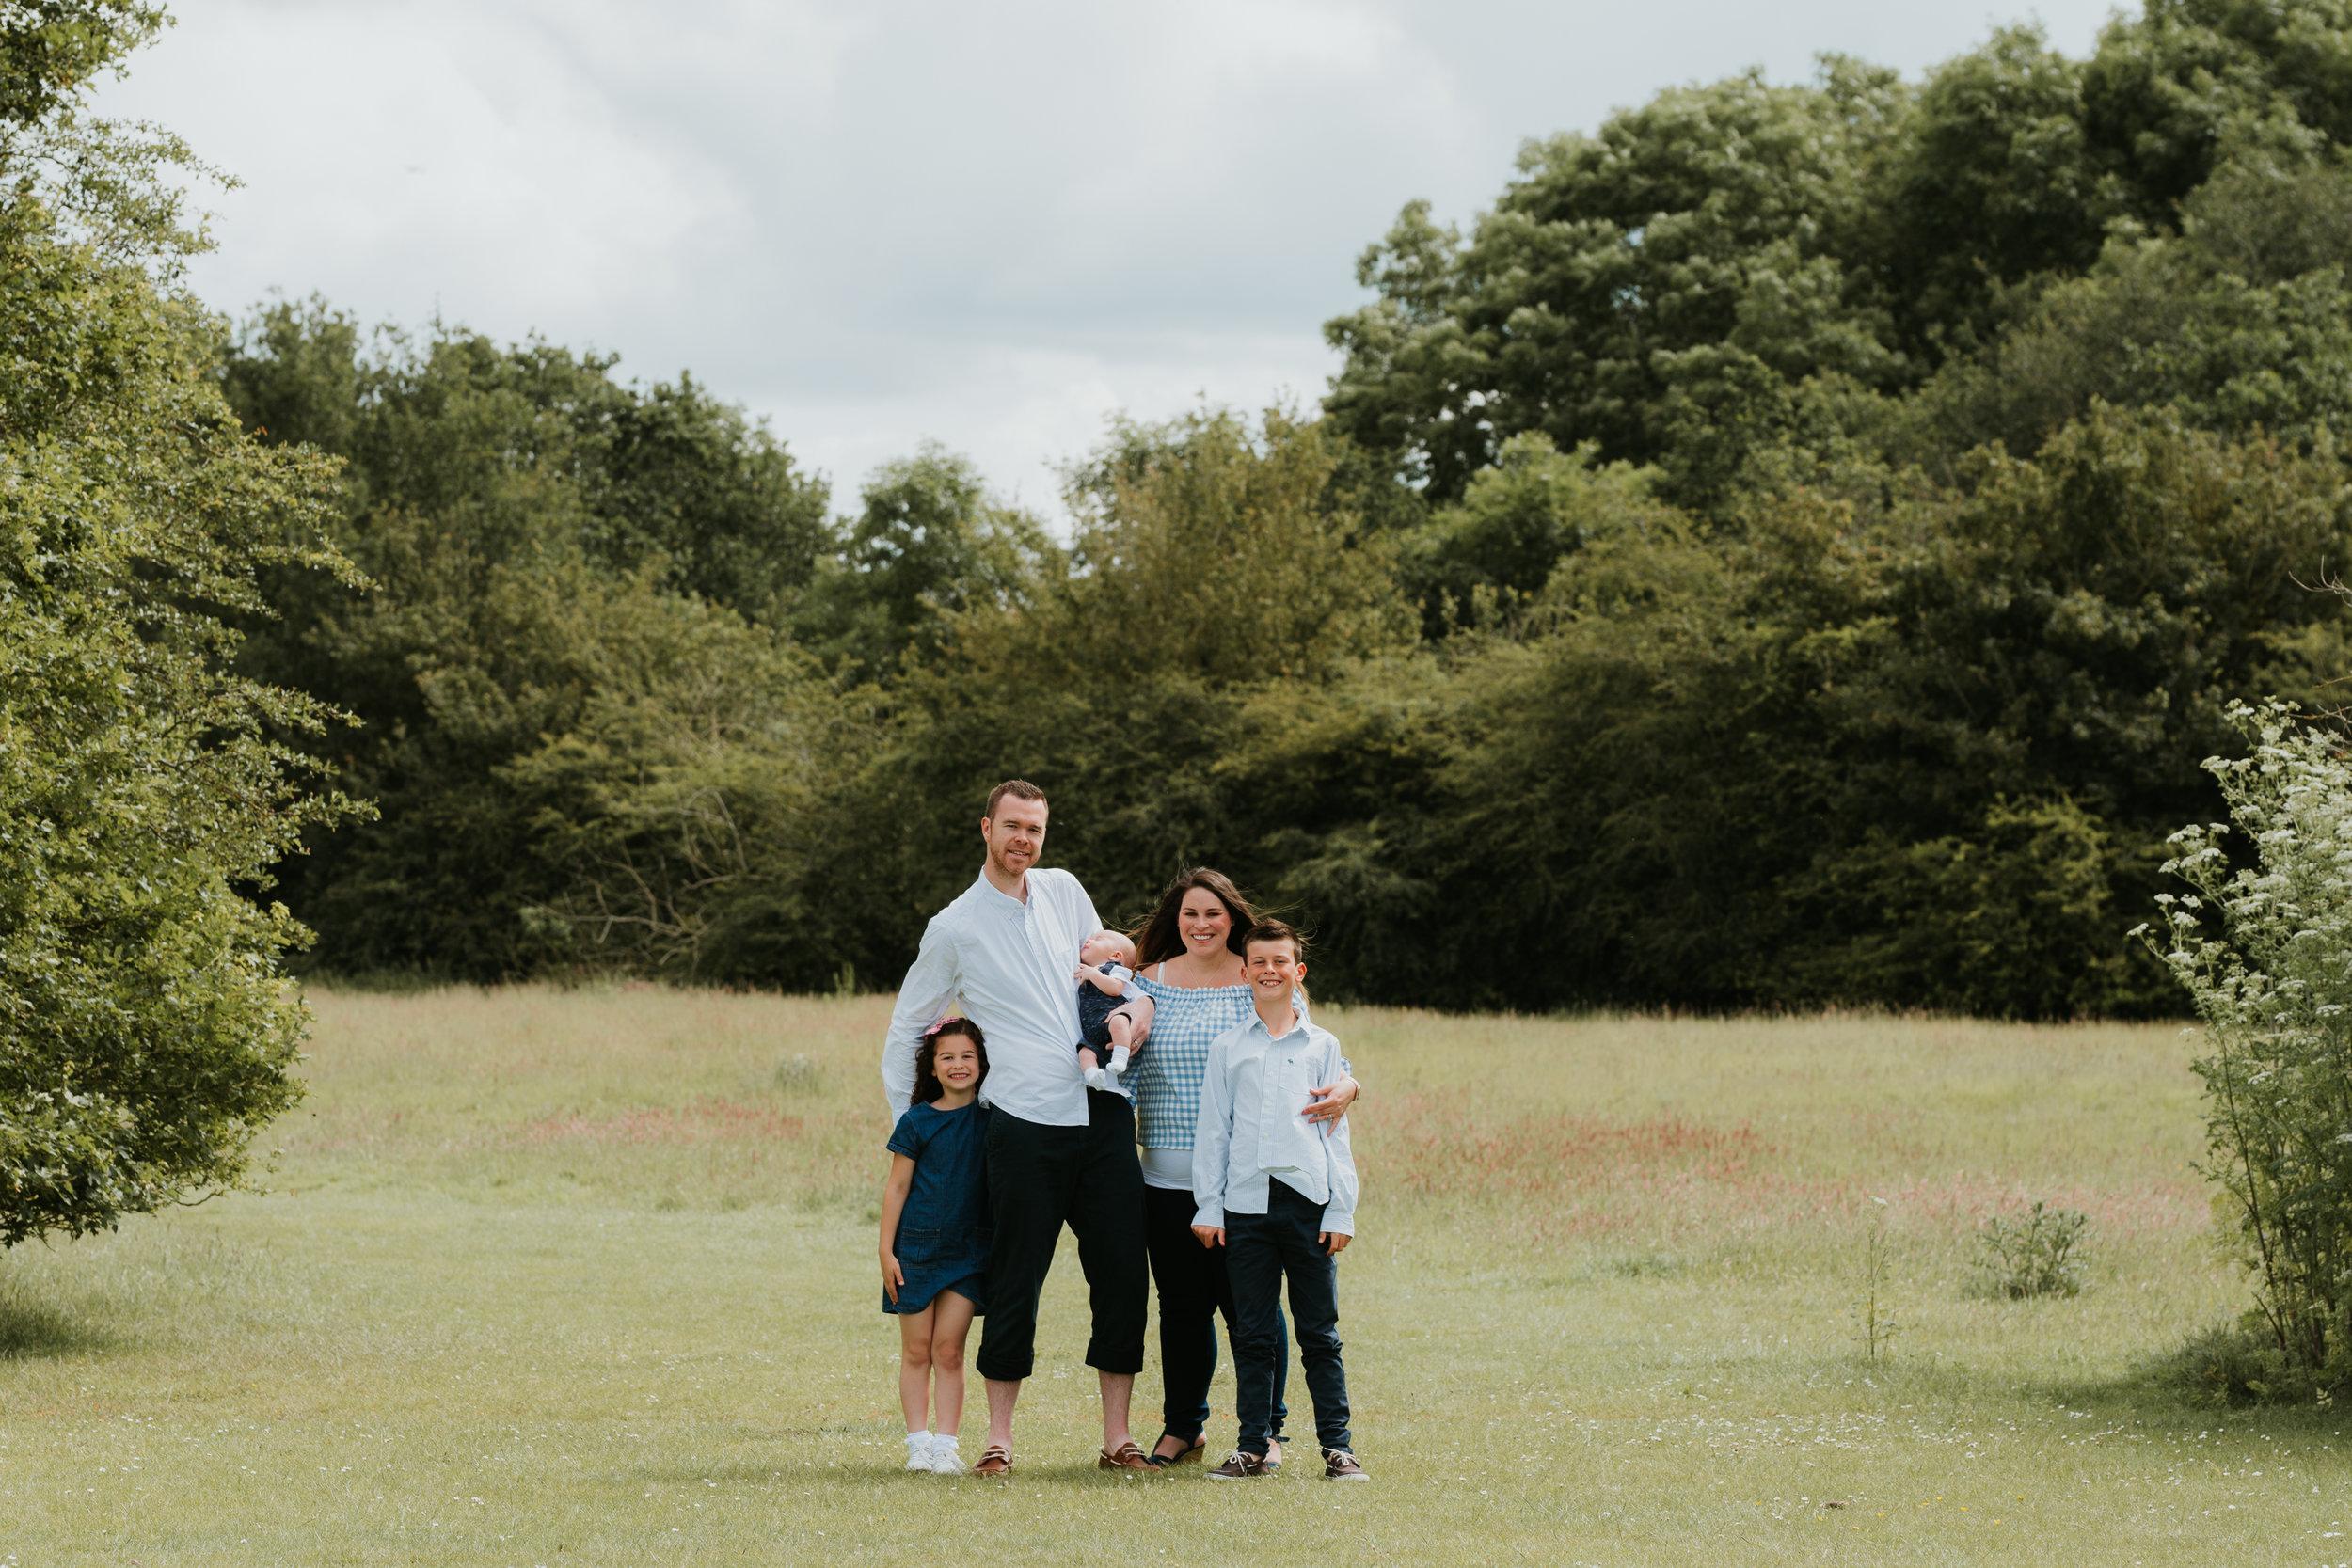 outdoor family photos Wokingham